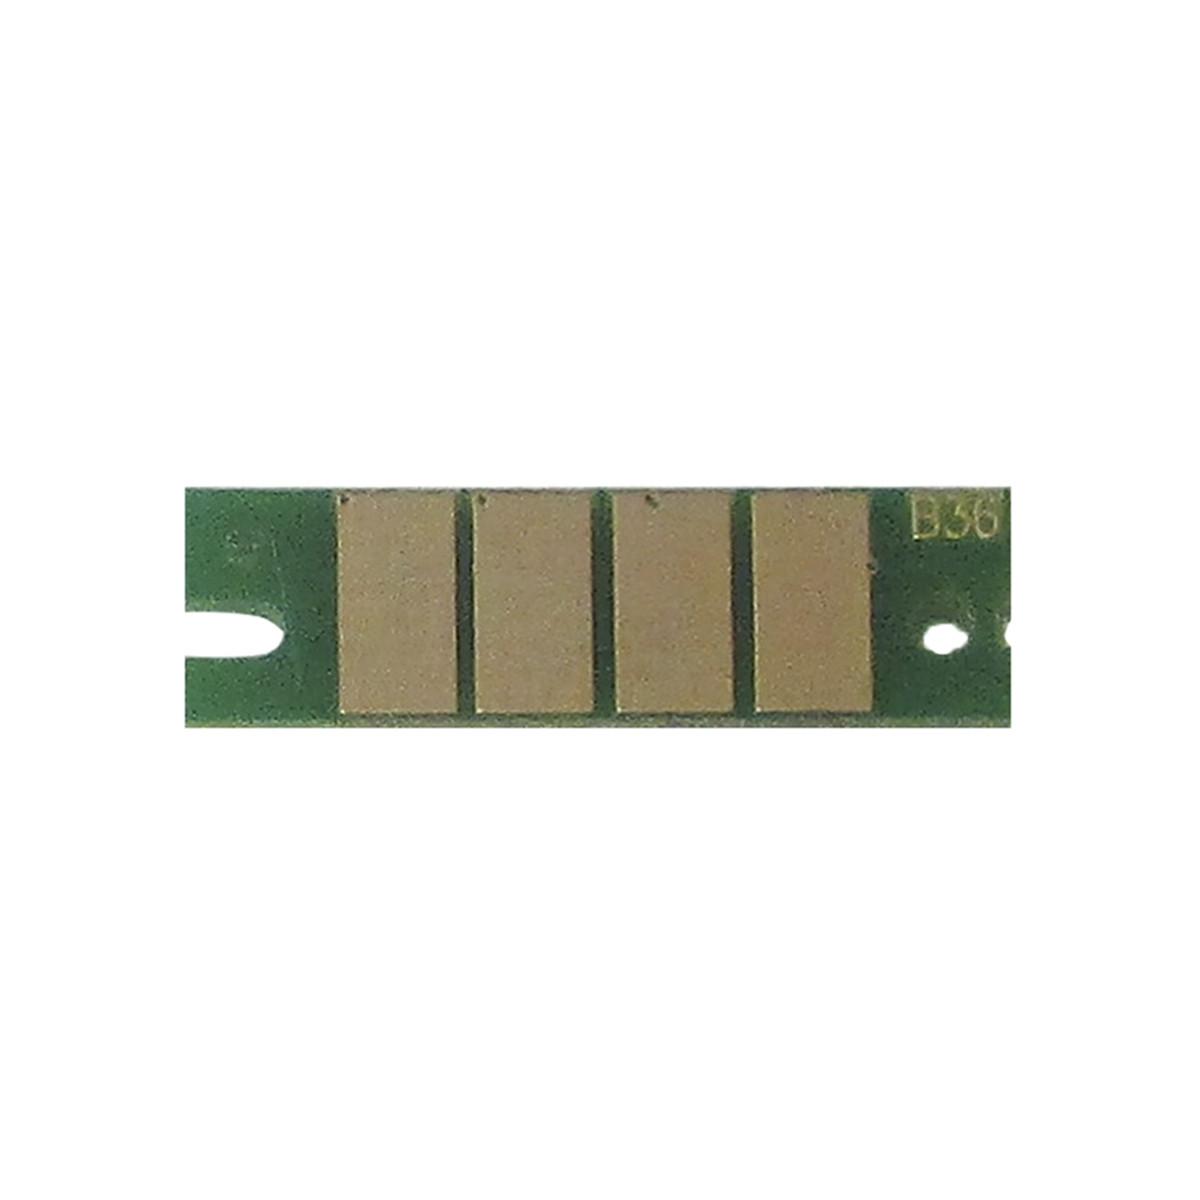 Chip Ricoh Aficio SP310 SP311 | SP-310SFNw SP-310DNw SP-311SFNw | 3.500 páginas